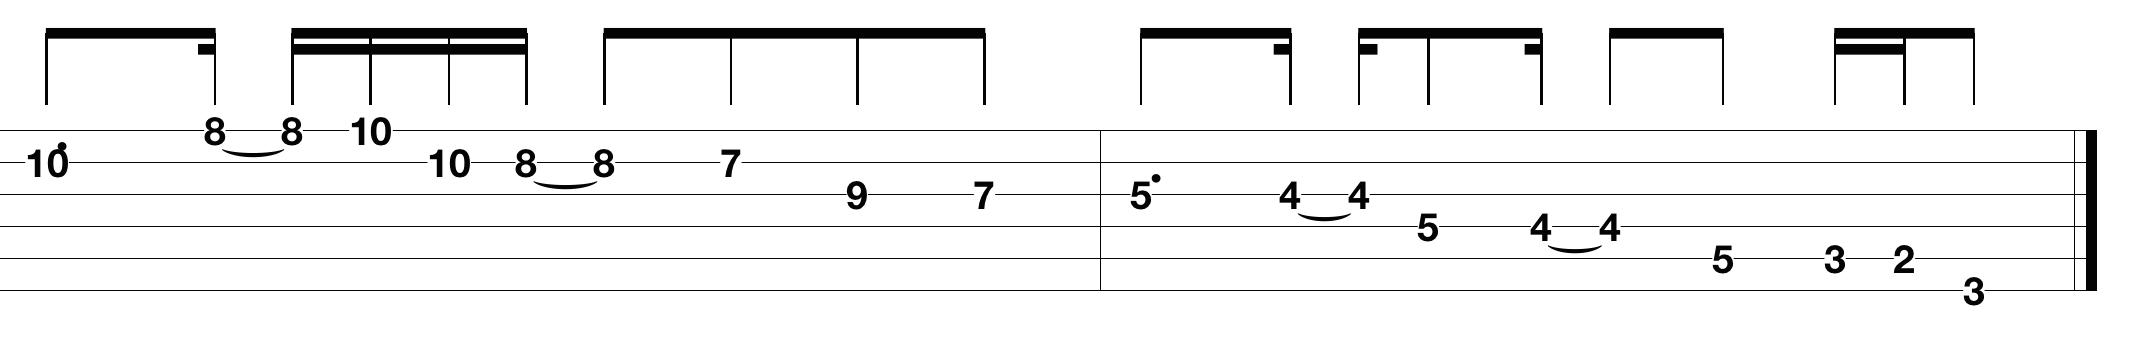 blues-guitar-lessons-online_2.png